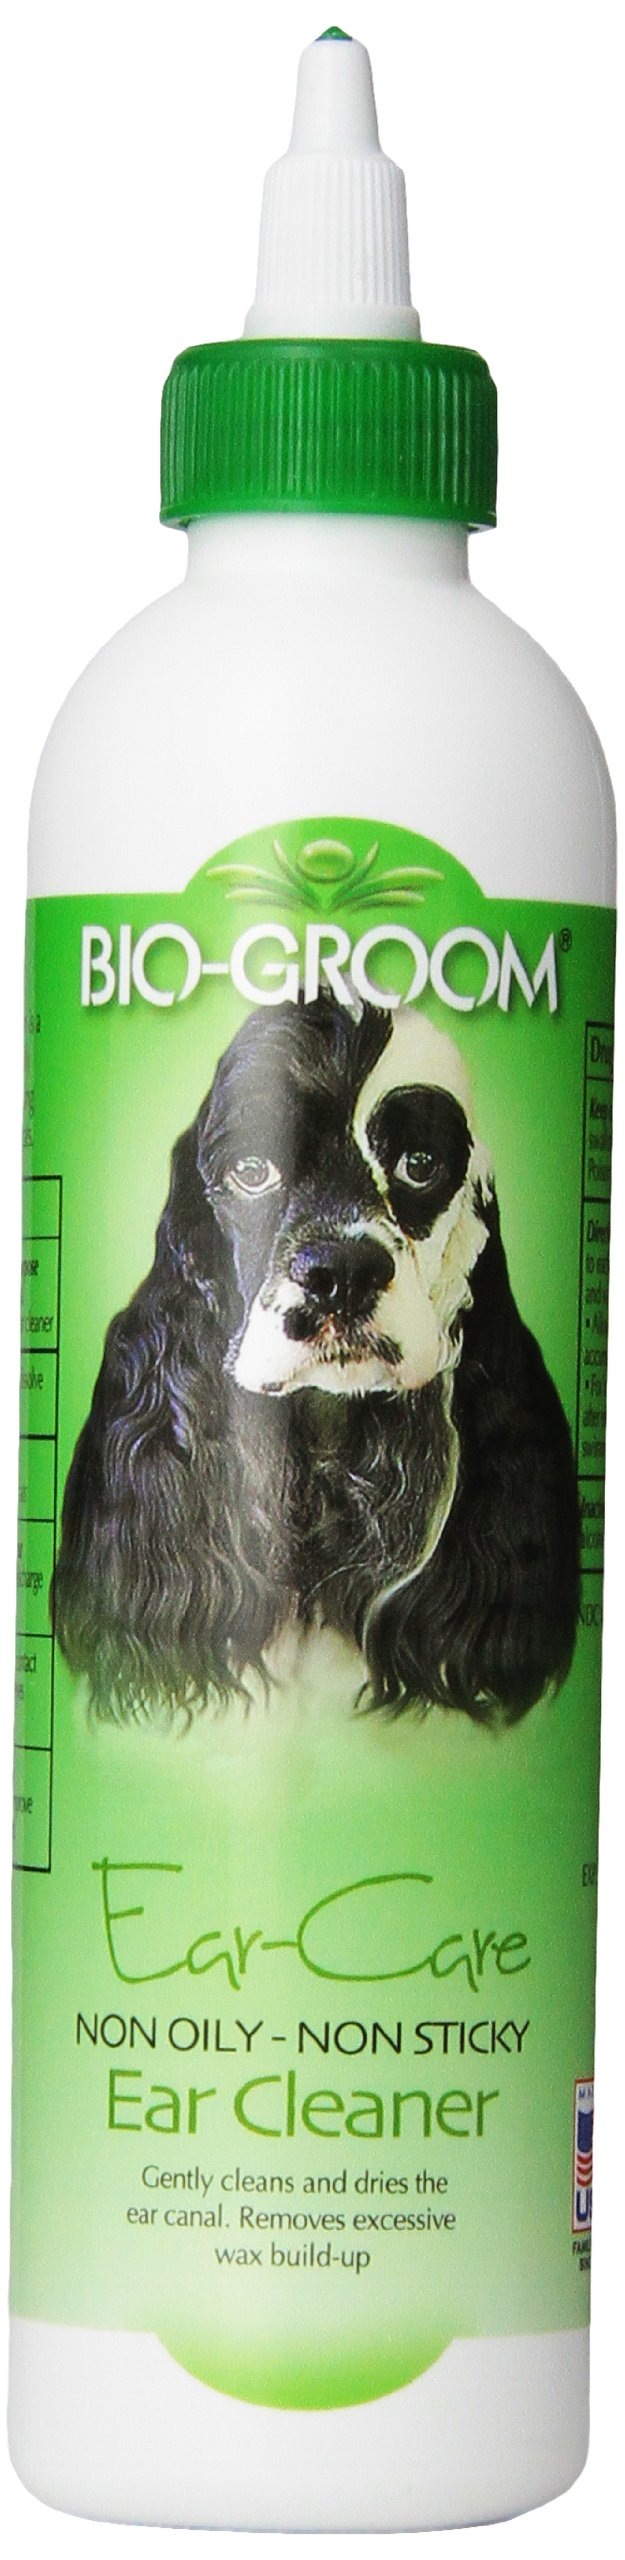 Bio-Groom Pet Ear Care Cleaner, 8-Ounce